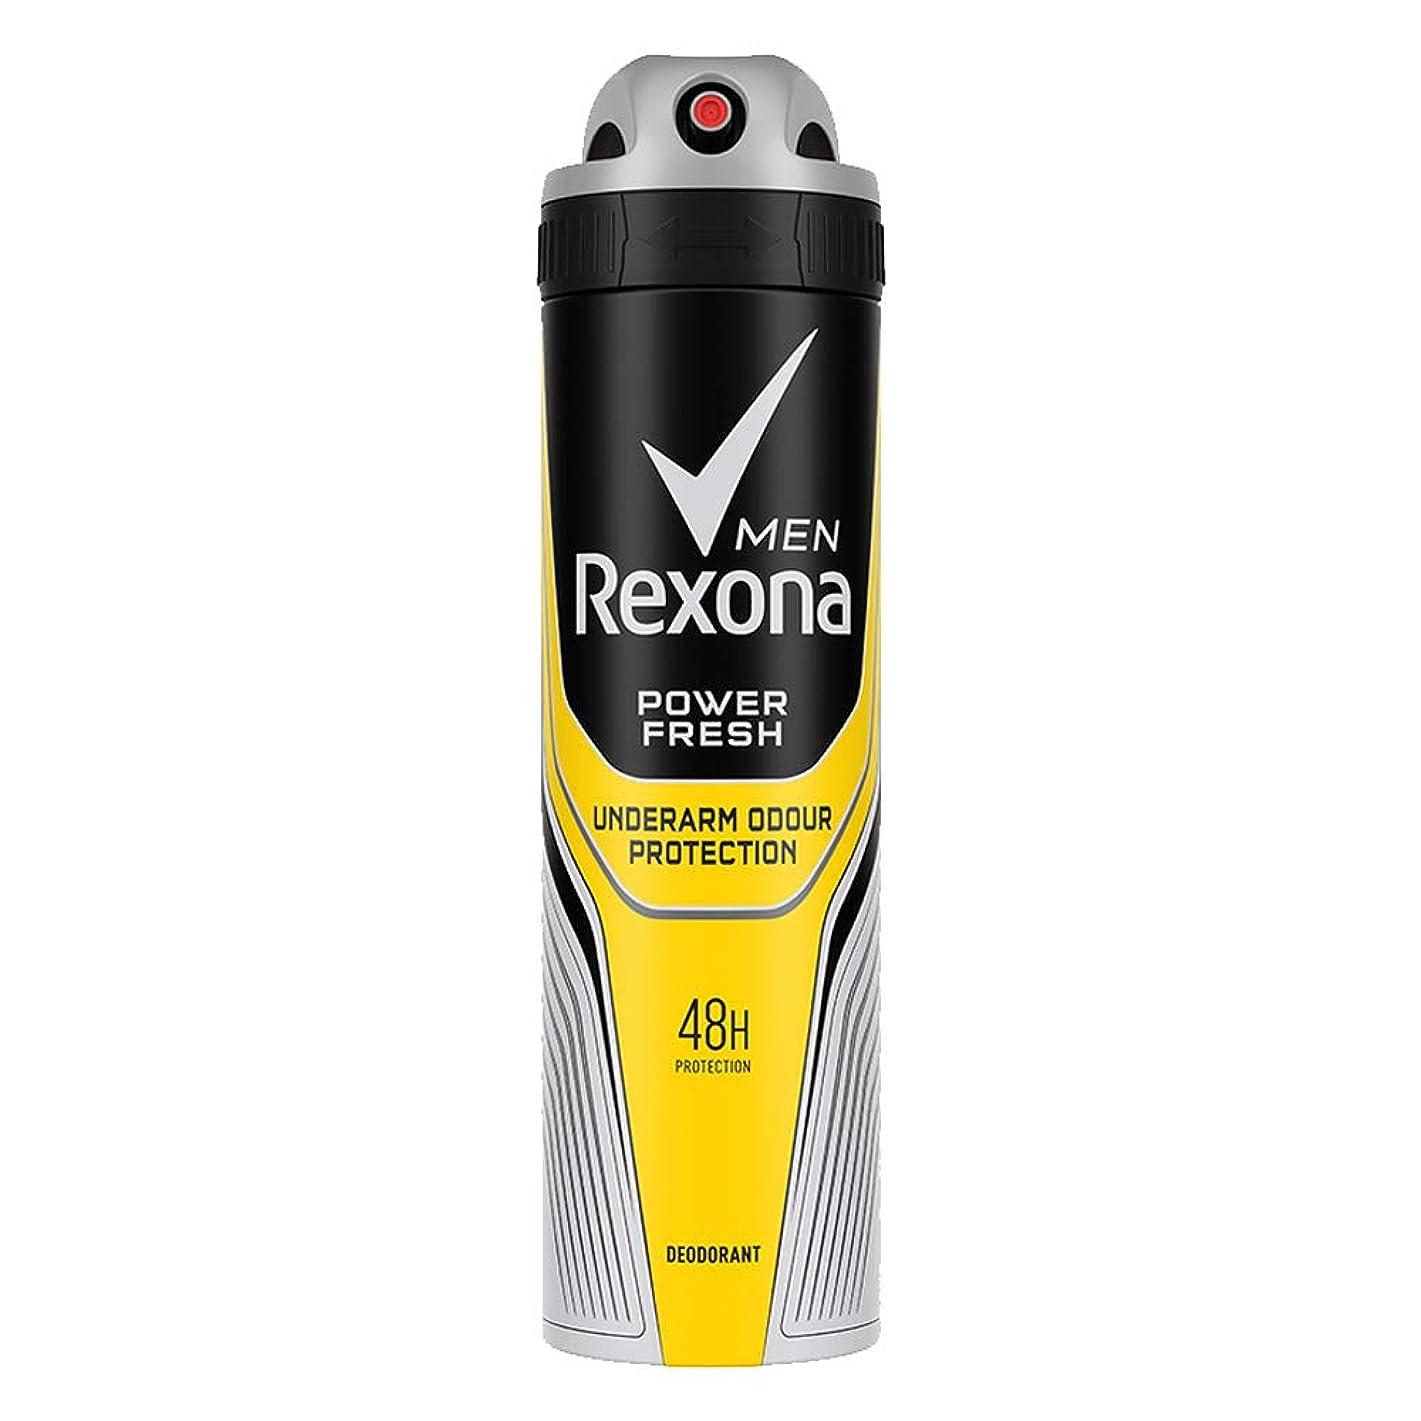 構成絶壁副産物Rexona Men Power Fresh Underarm Protection Deodorant, 150 ml